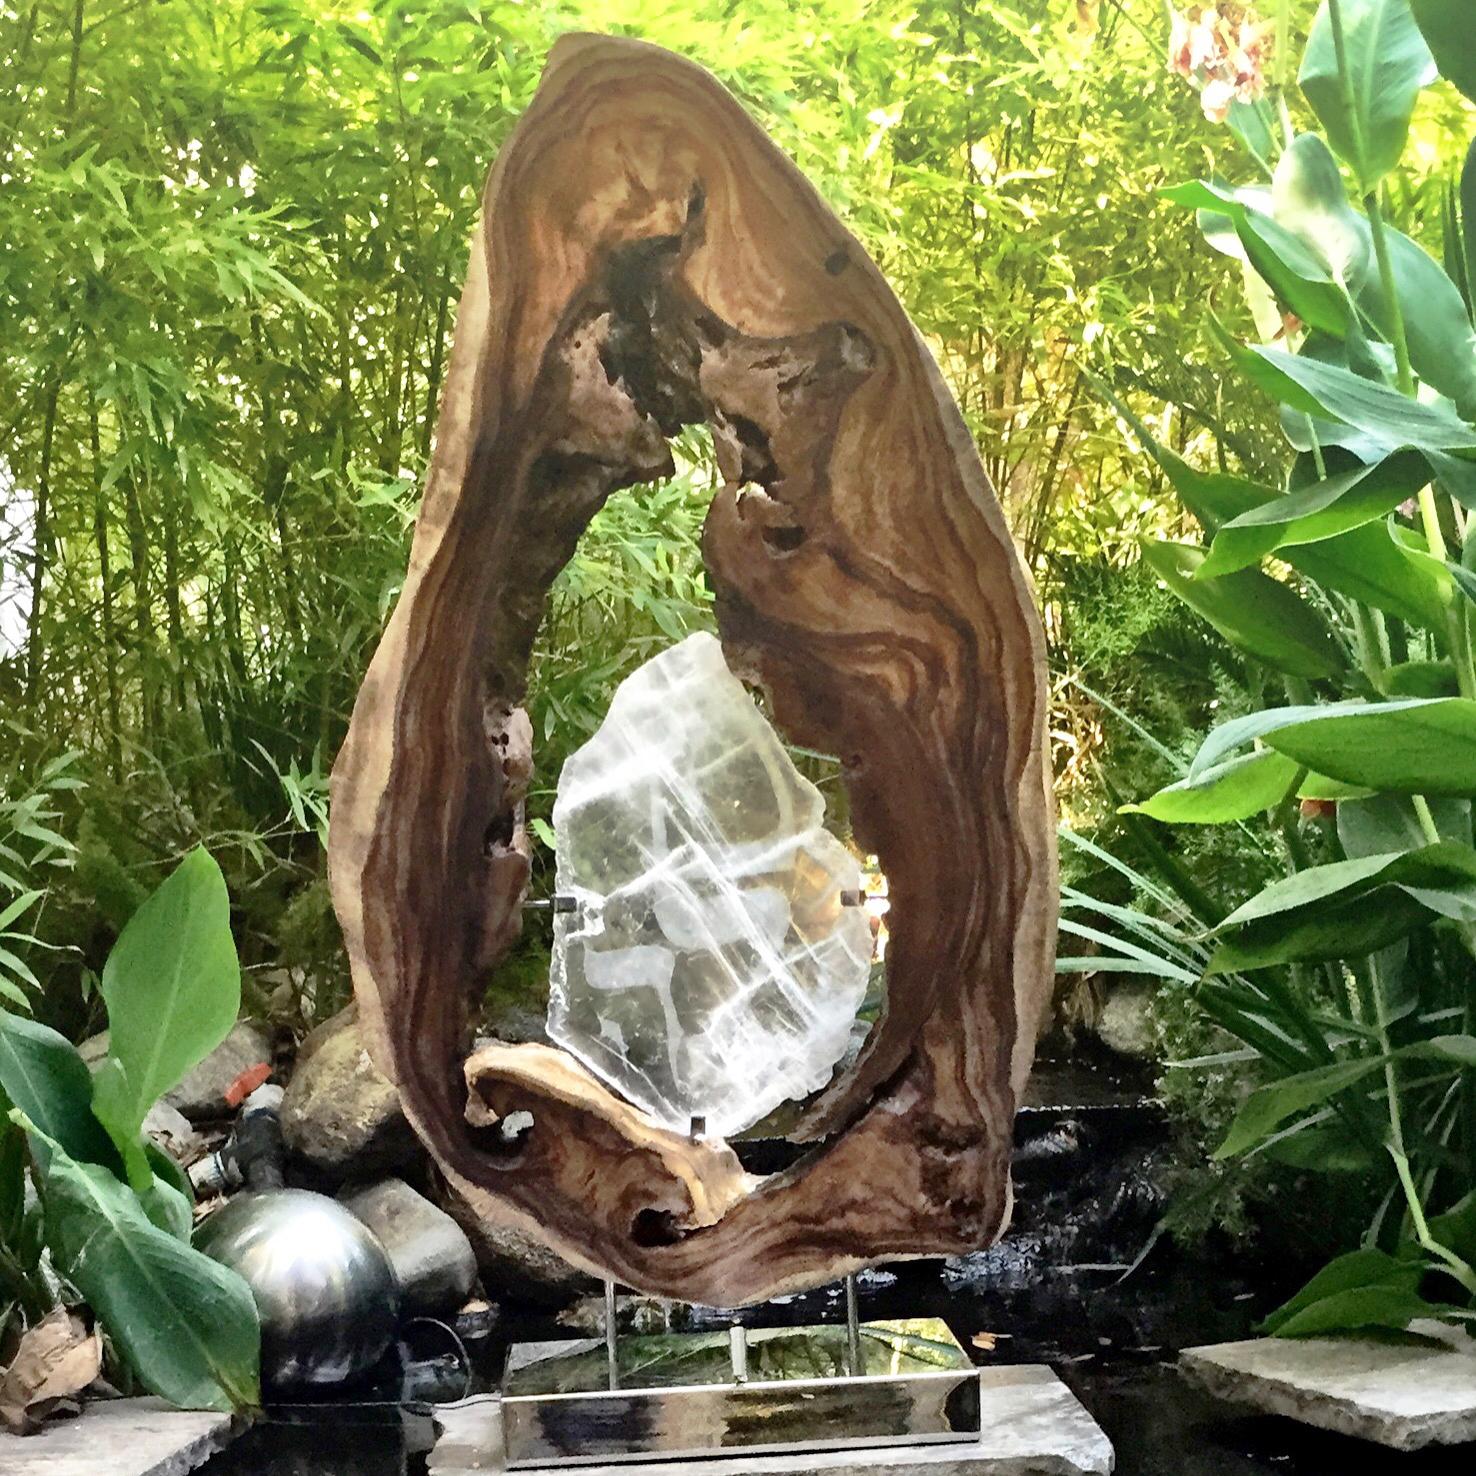 Sharing The Flame_Hand-carved Selenite_Acacia Wood_Light_Steel - 57x31x12 in - $1440.jpg